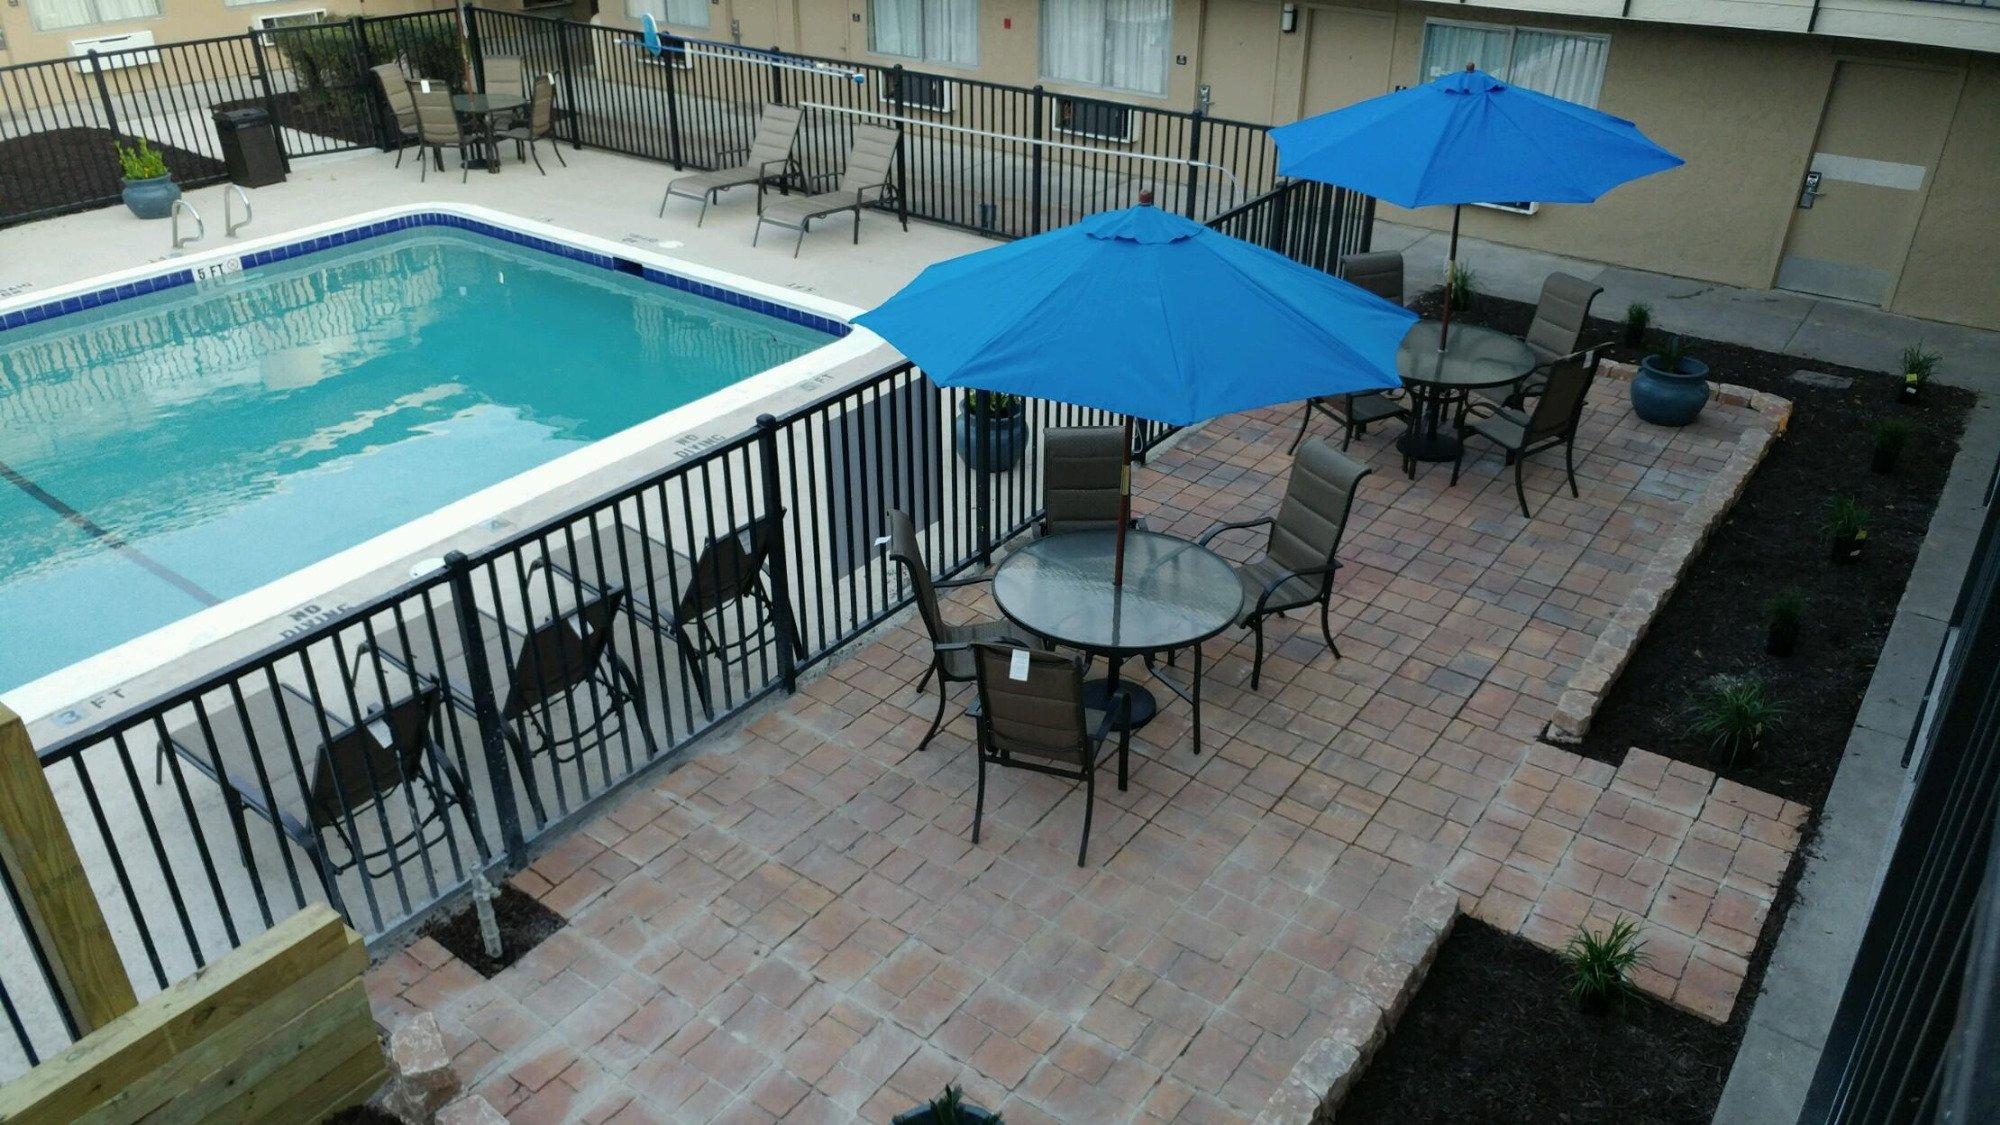 Dogwood Inn and Suites